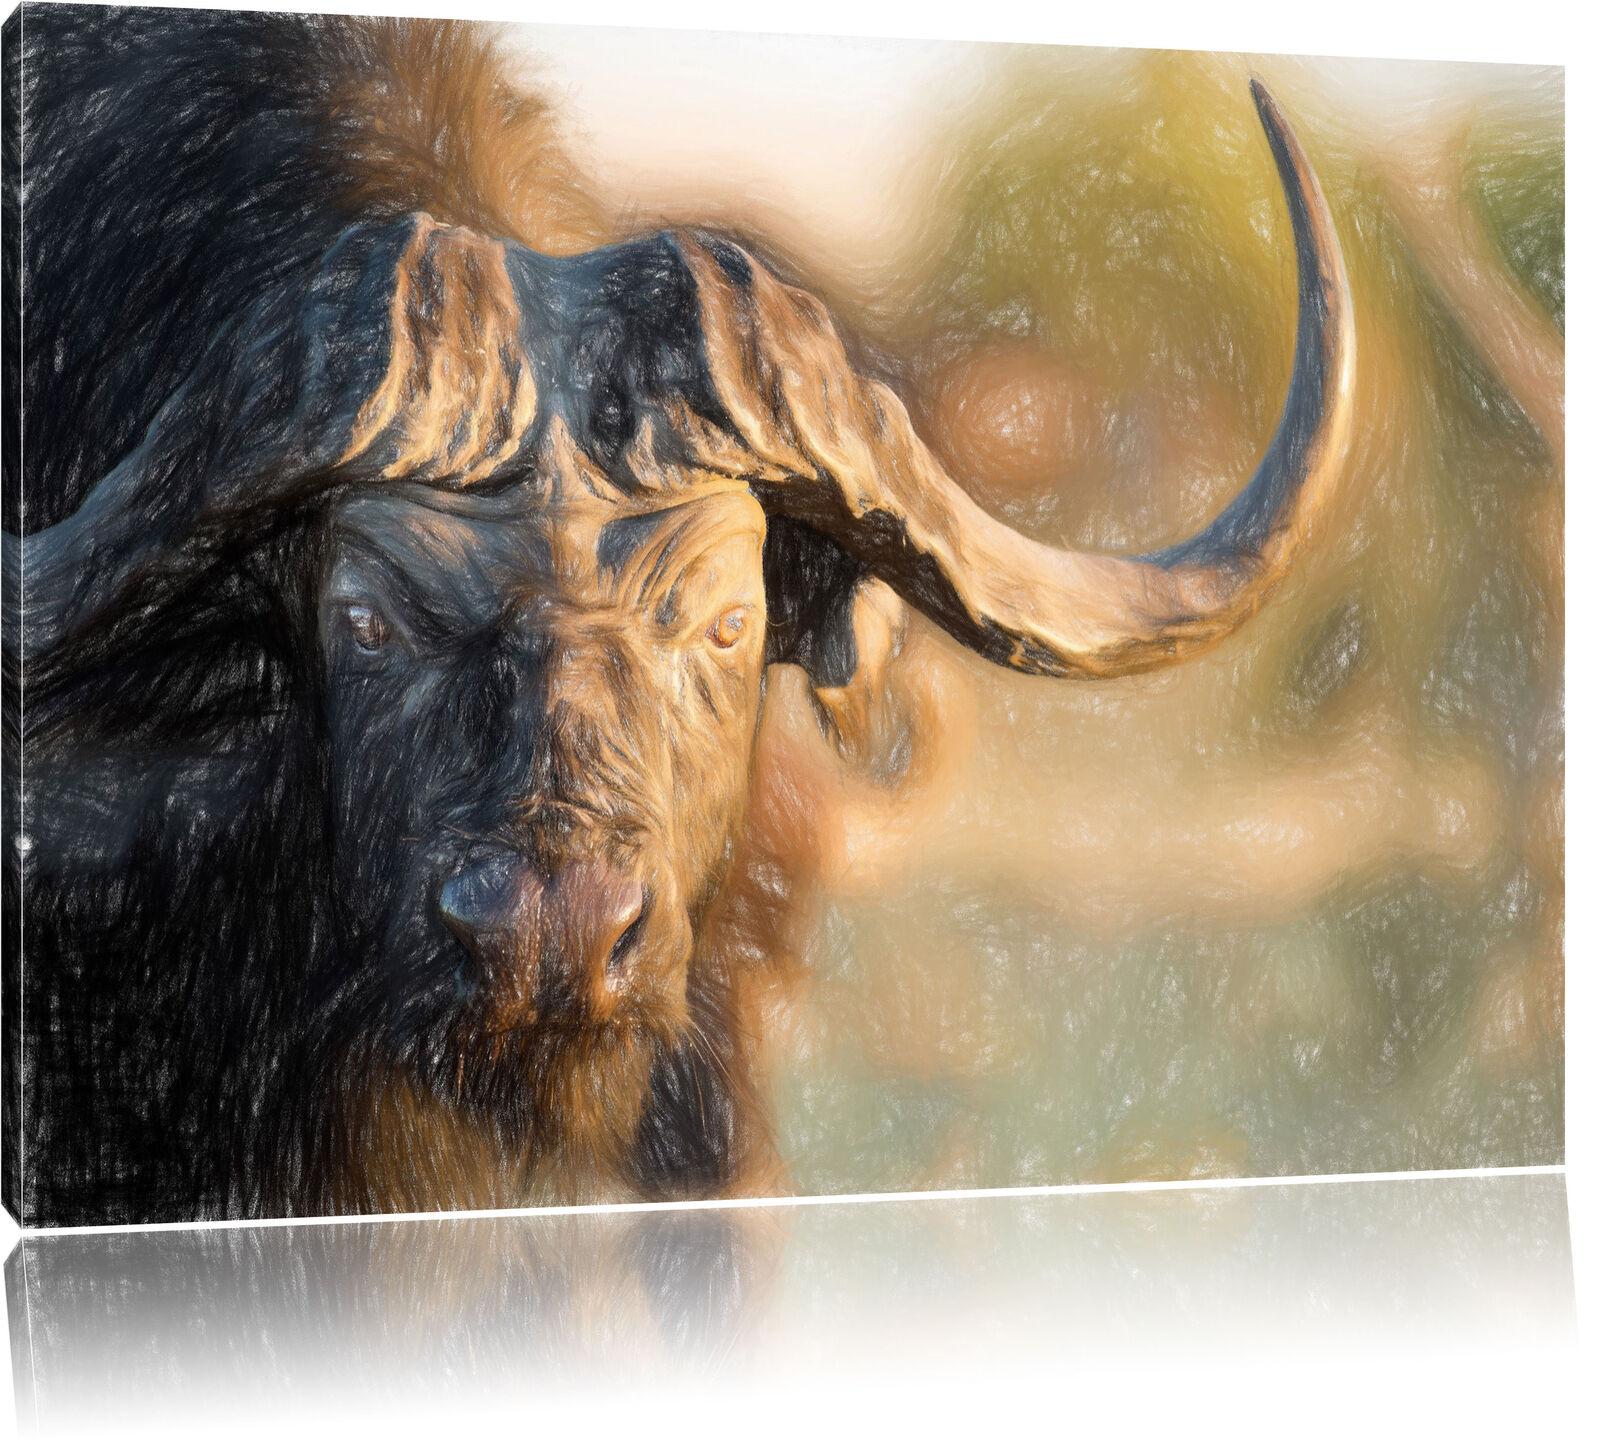 Kaffernbüffel mit kräftigen Hörnern Kunst Buntstift Effekt Leinwandbild Wanddeko